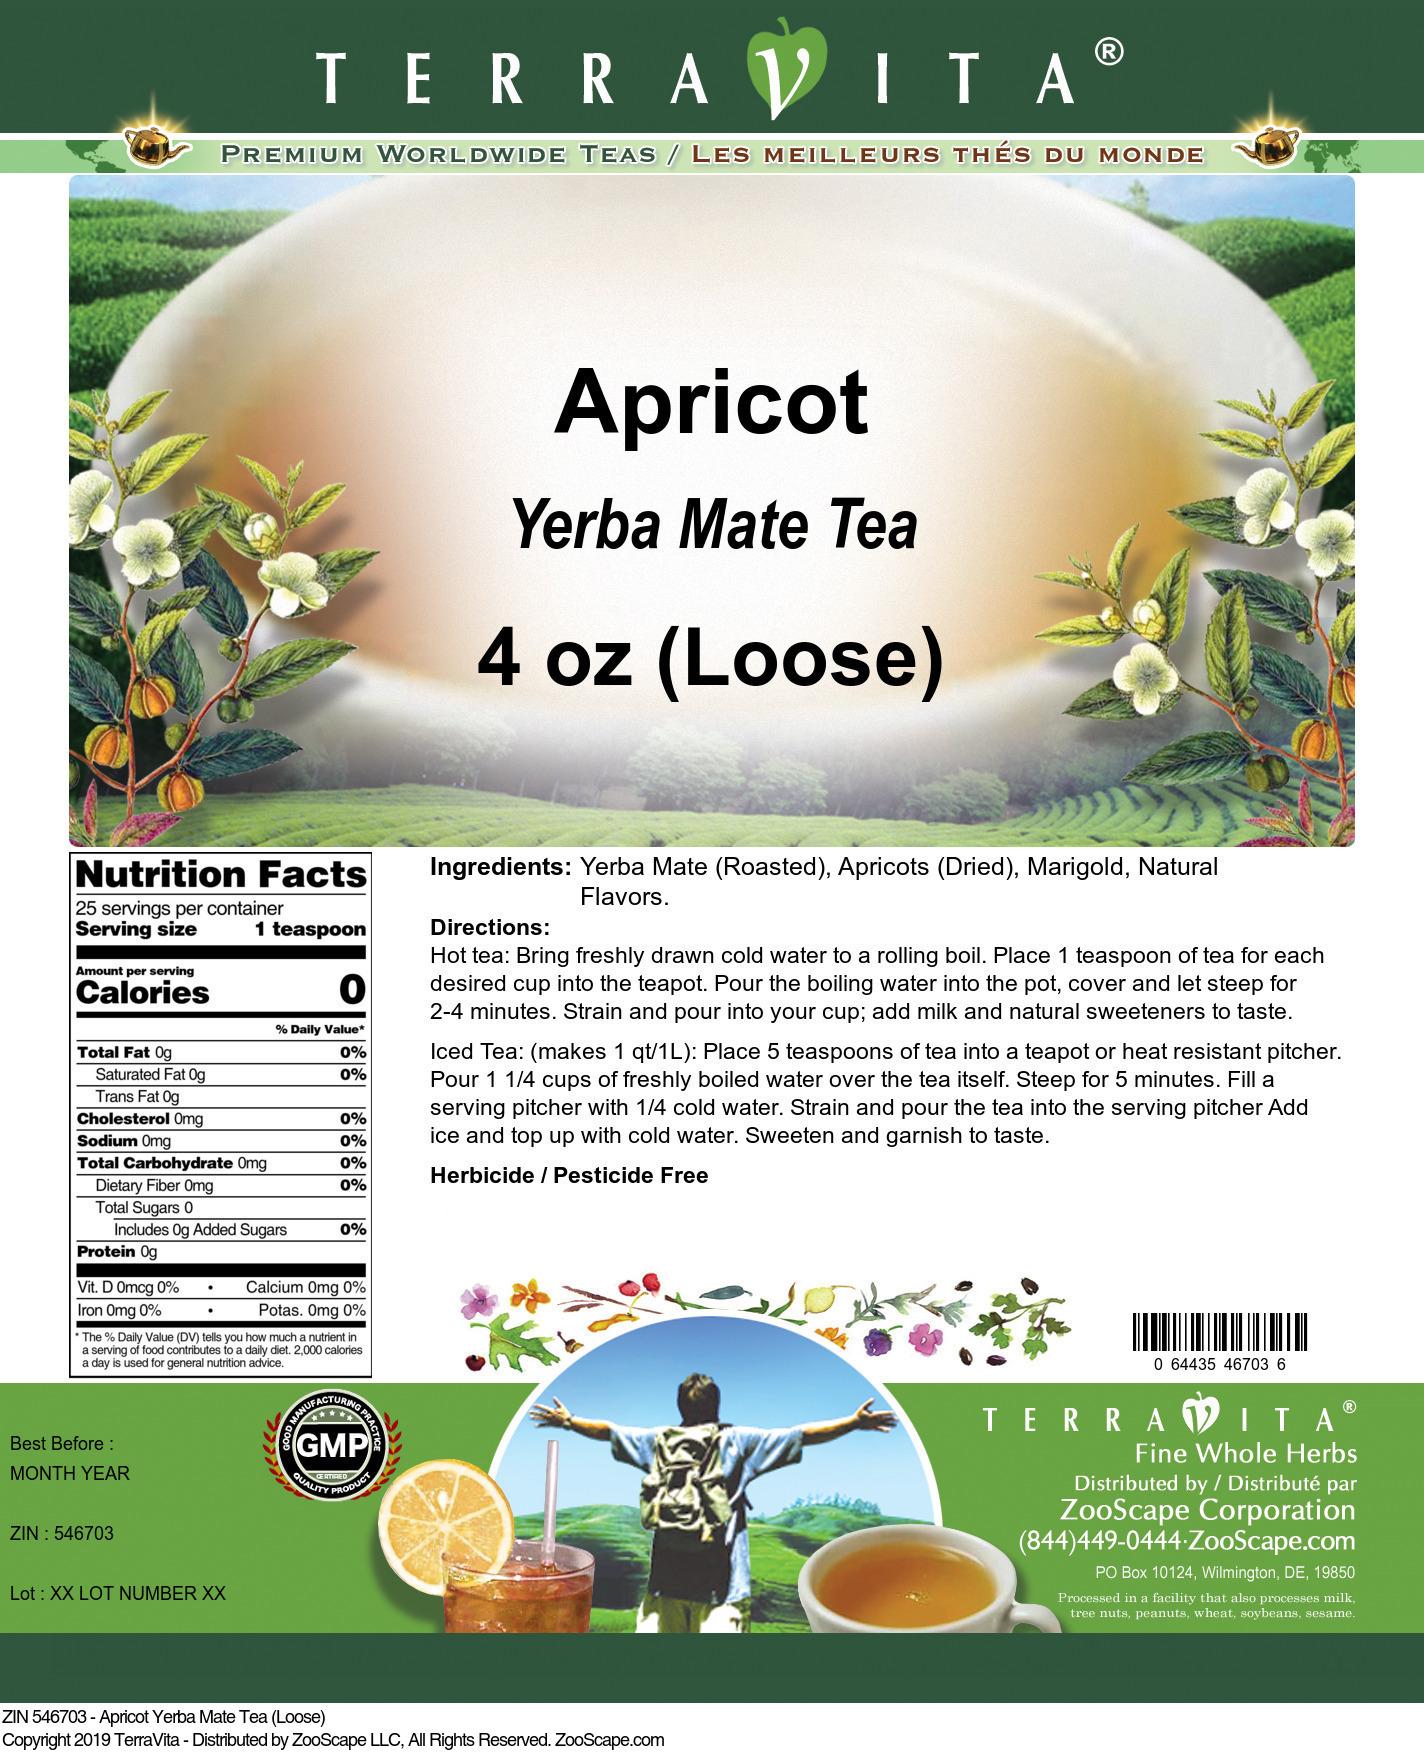 Apricot Yerba Mate Tea (Loose)